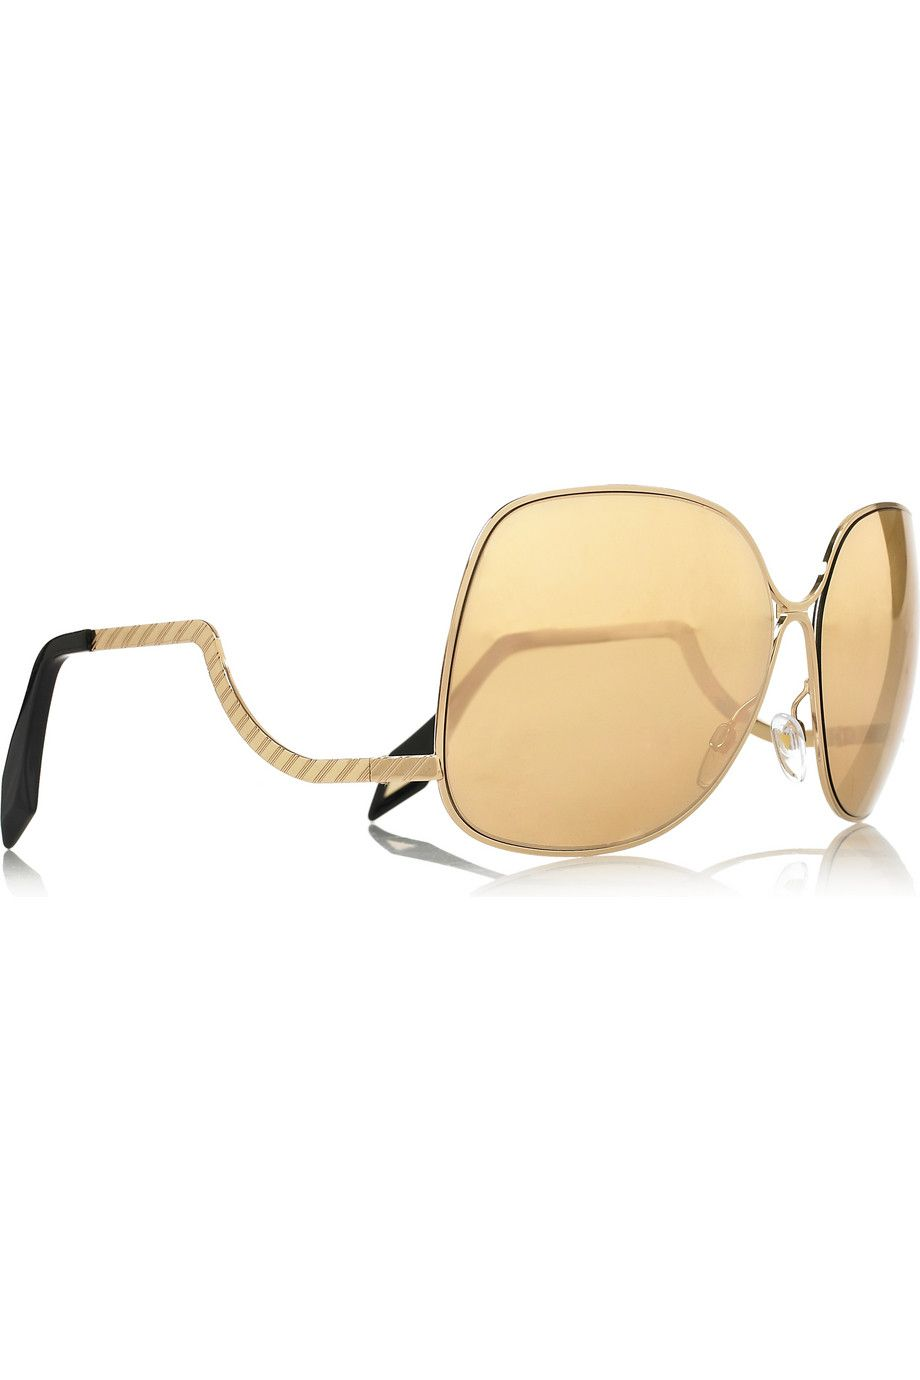 ffea9452fec0 Victoria Beckham. VICTORIA BECKHAM Gold Sunglasses ...